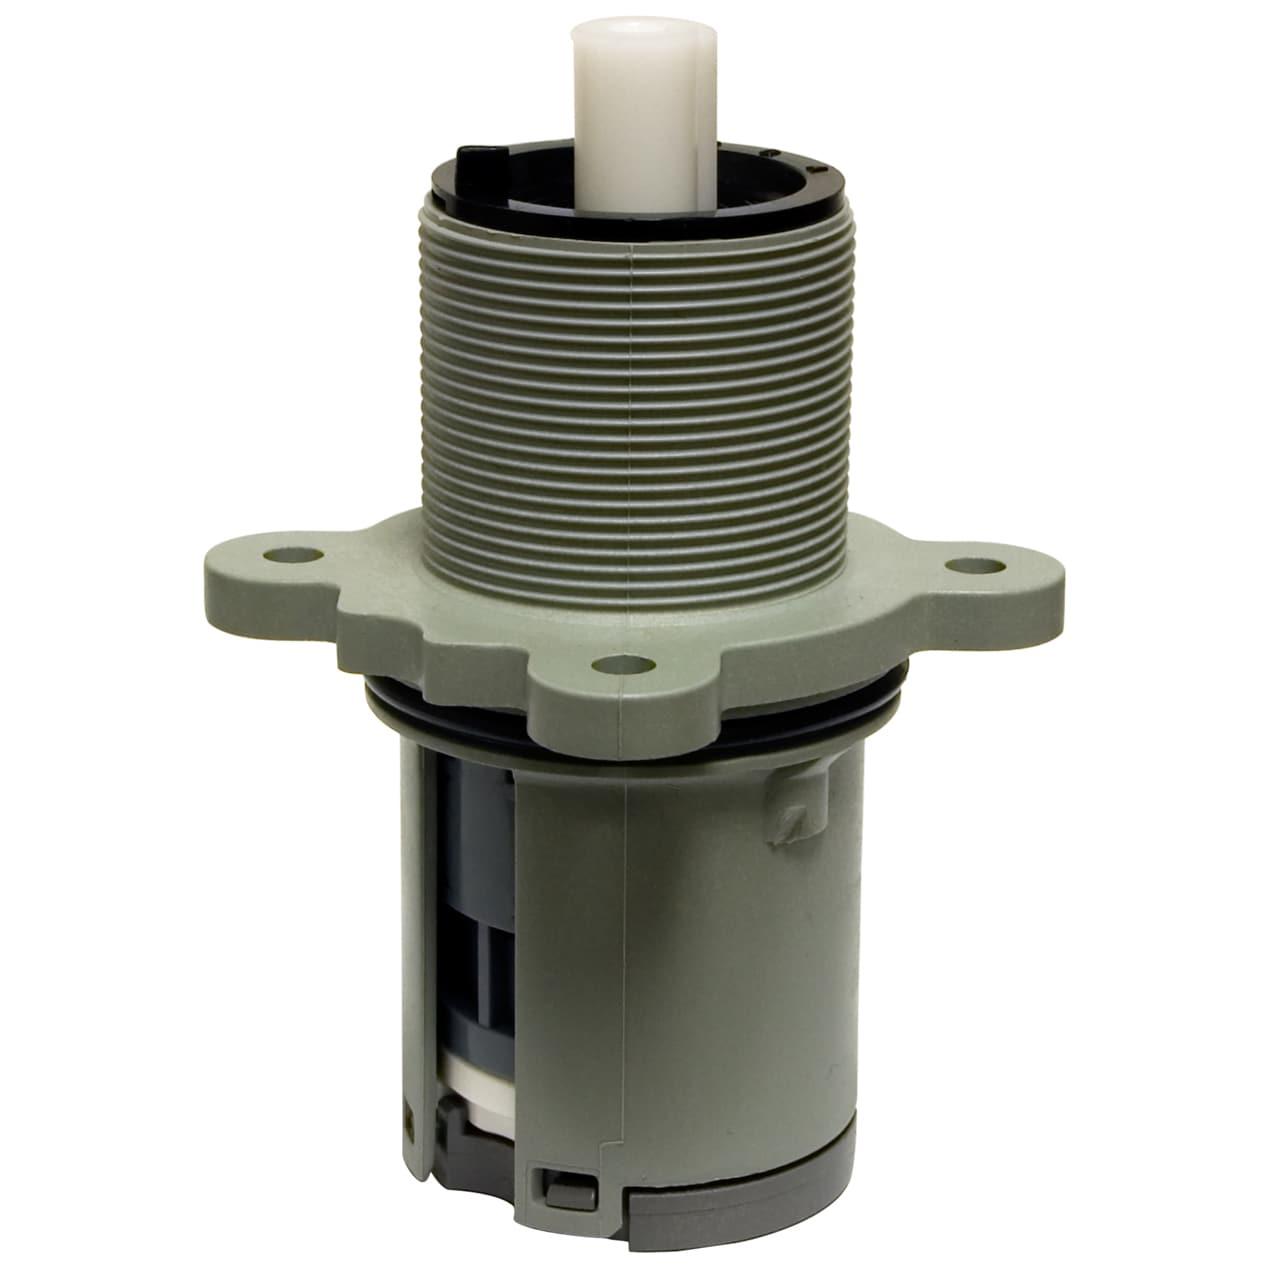 Lincoln Pfister 974-042 Ceramic Cartridge (Cartridge Cera...